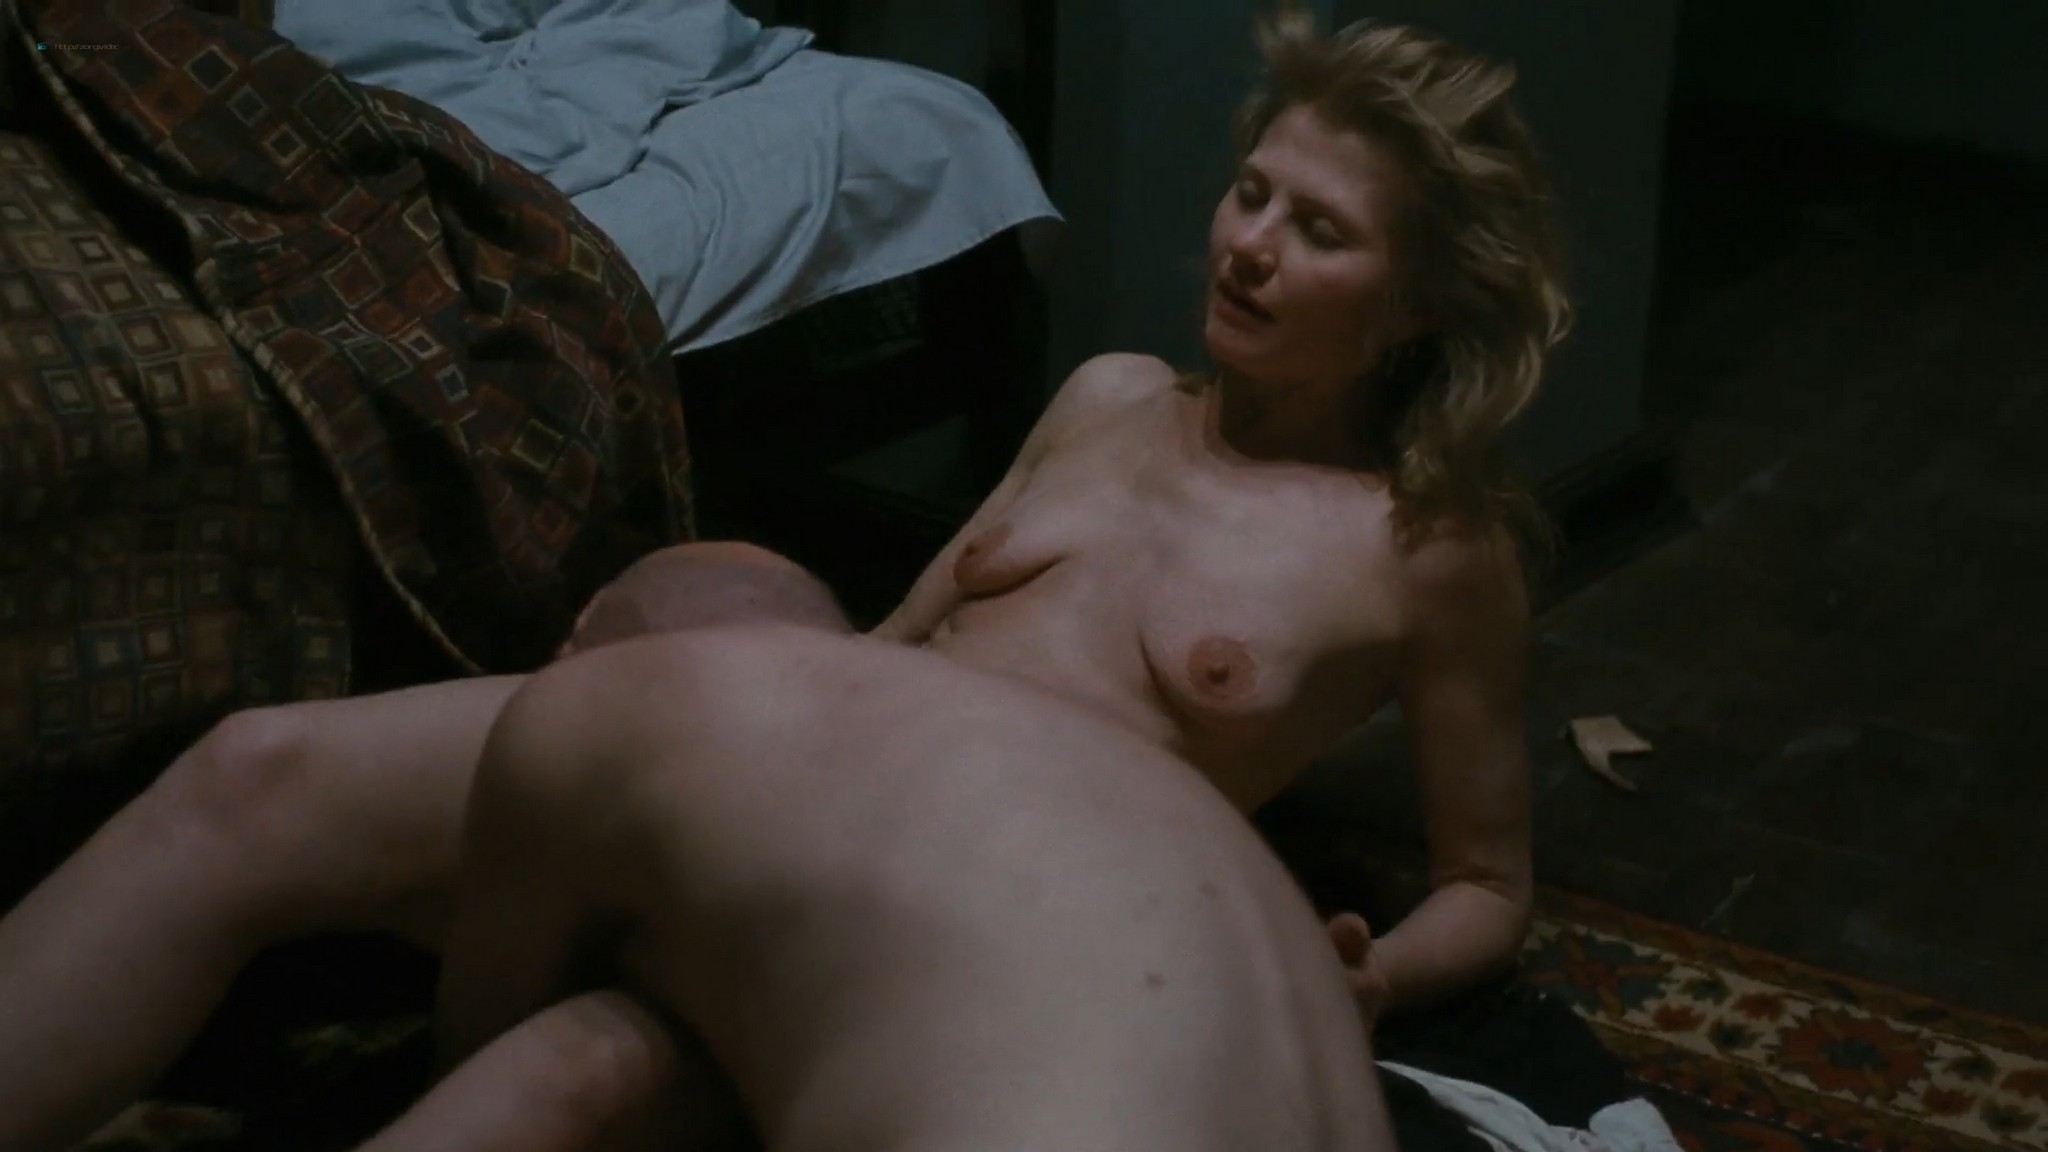 Olga Shkabarnya nude Natalia Berezhnaya nude explicit sex - DAU Natasha (2020) HD 1080p Web (18)